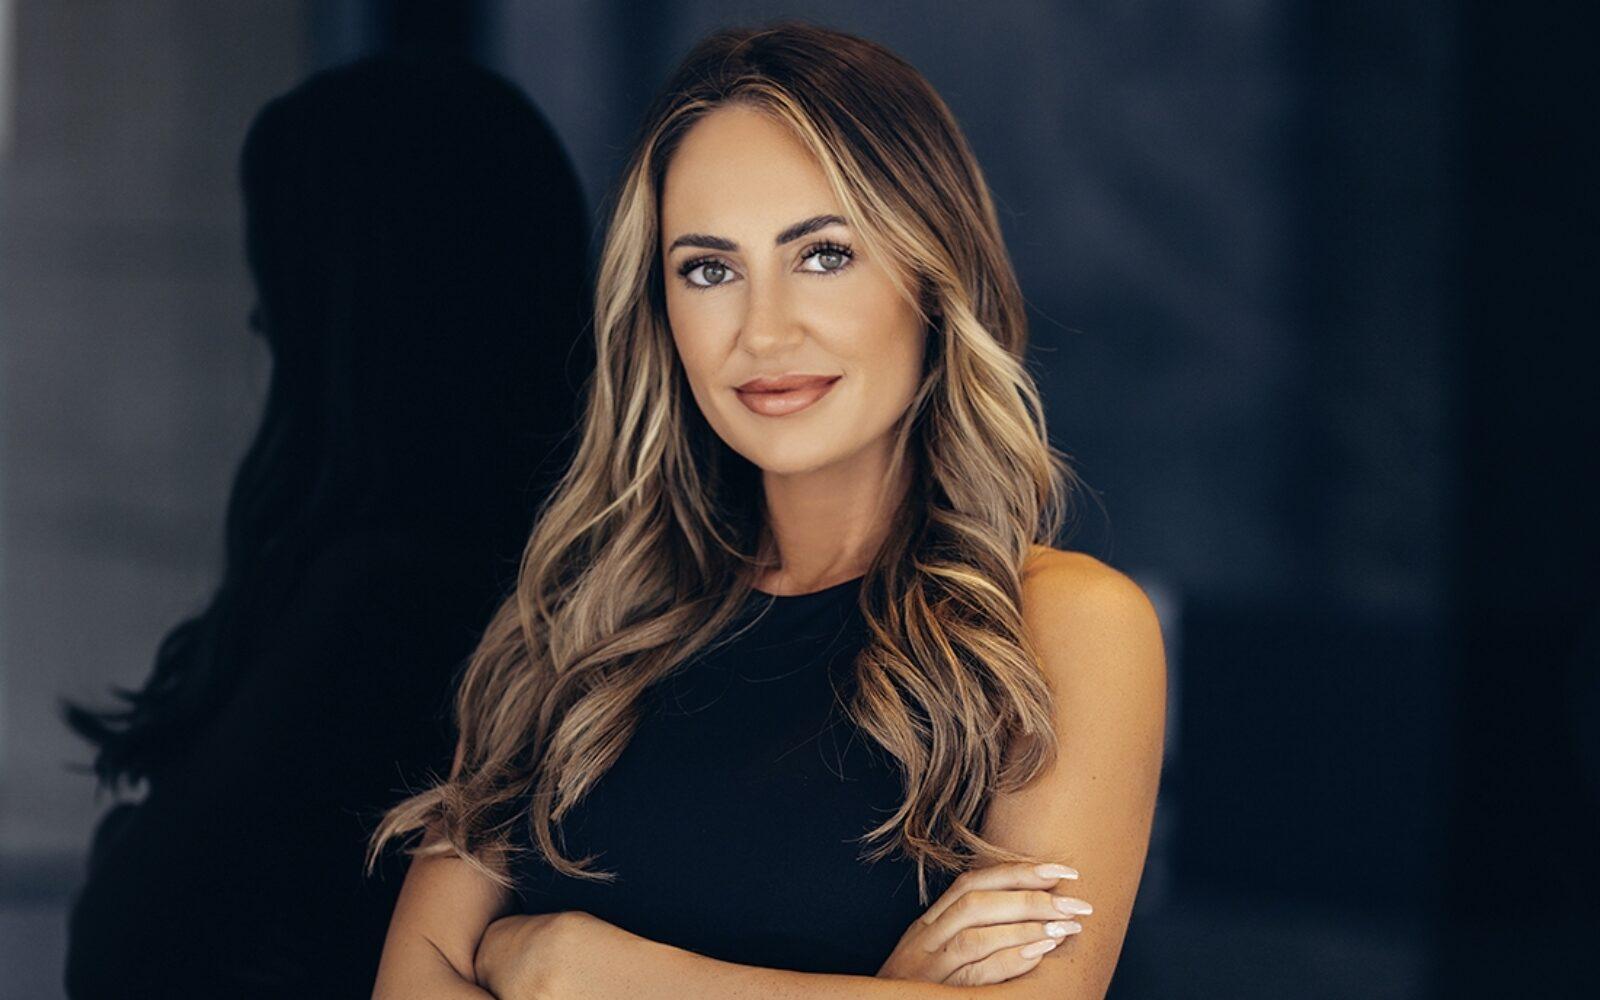 L'Couture founder Lyndsay Doran